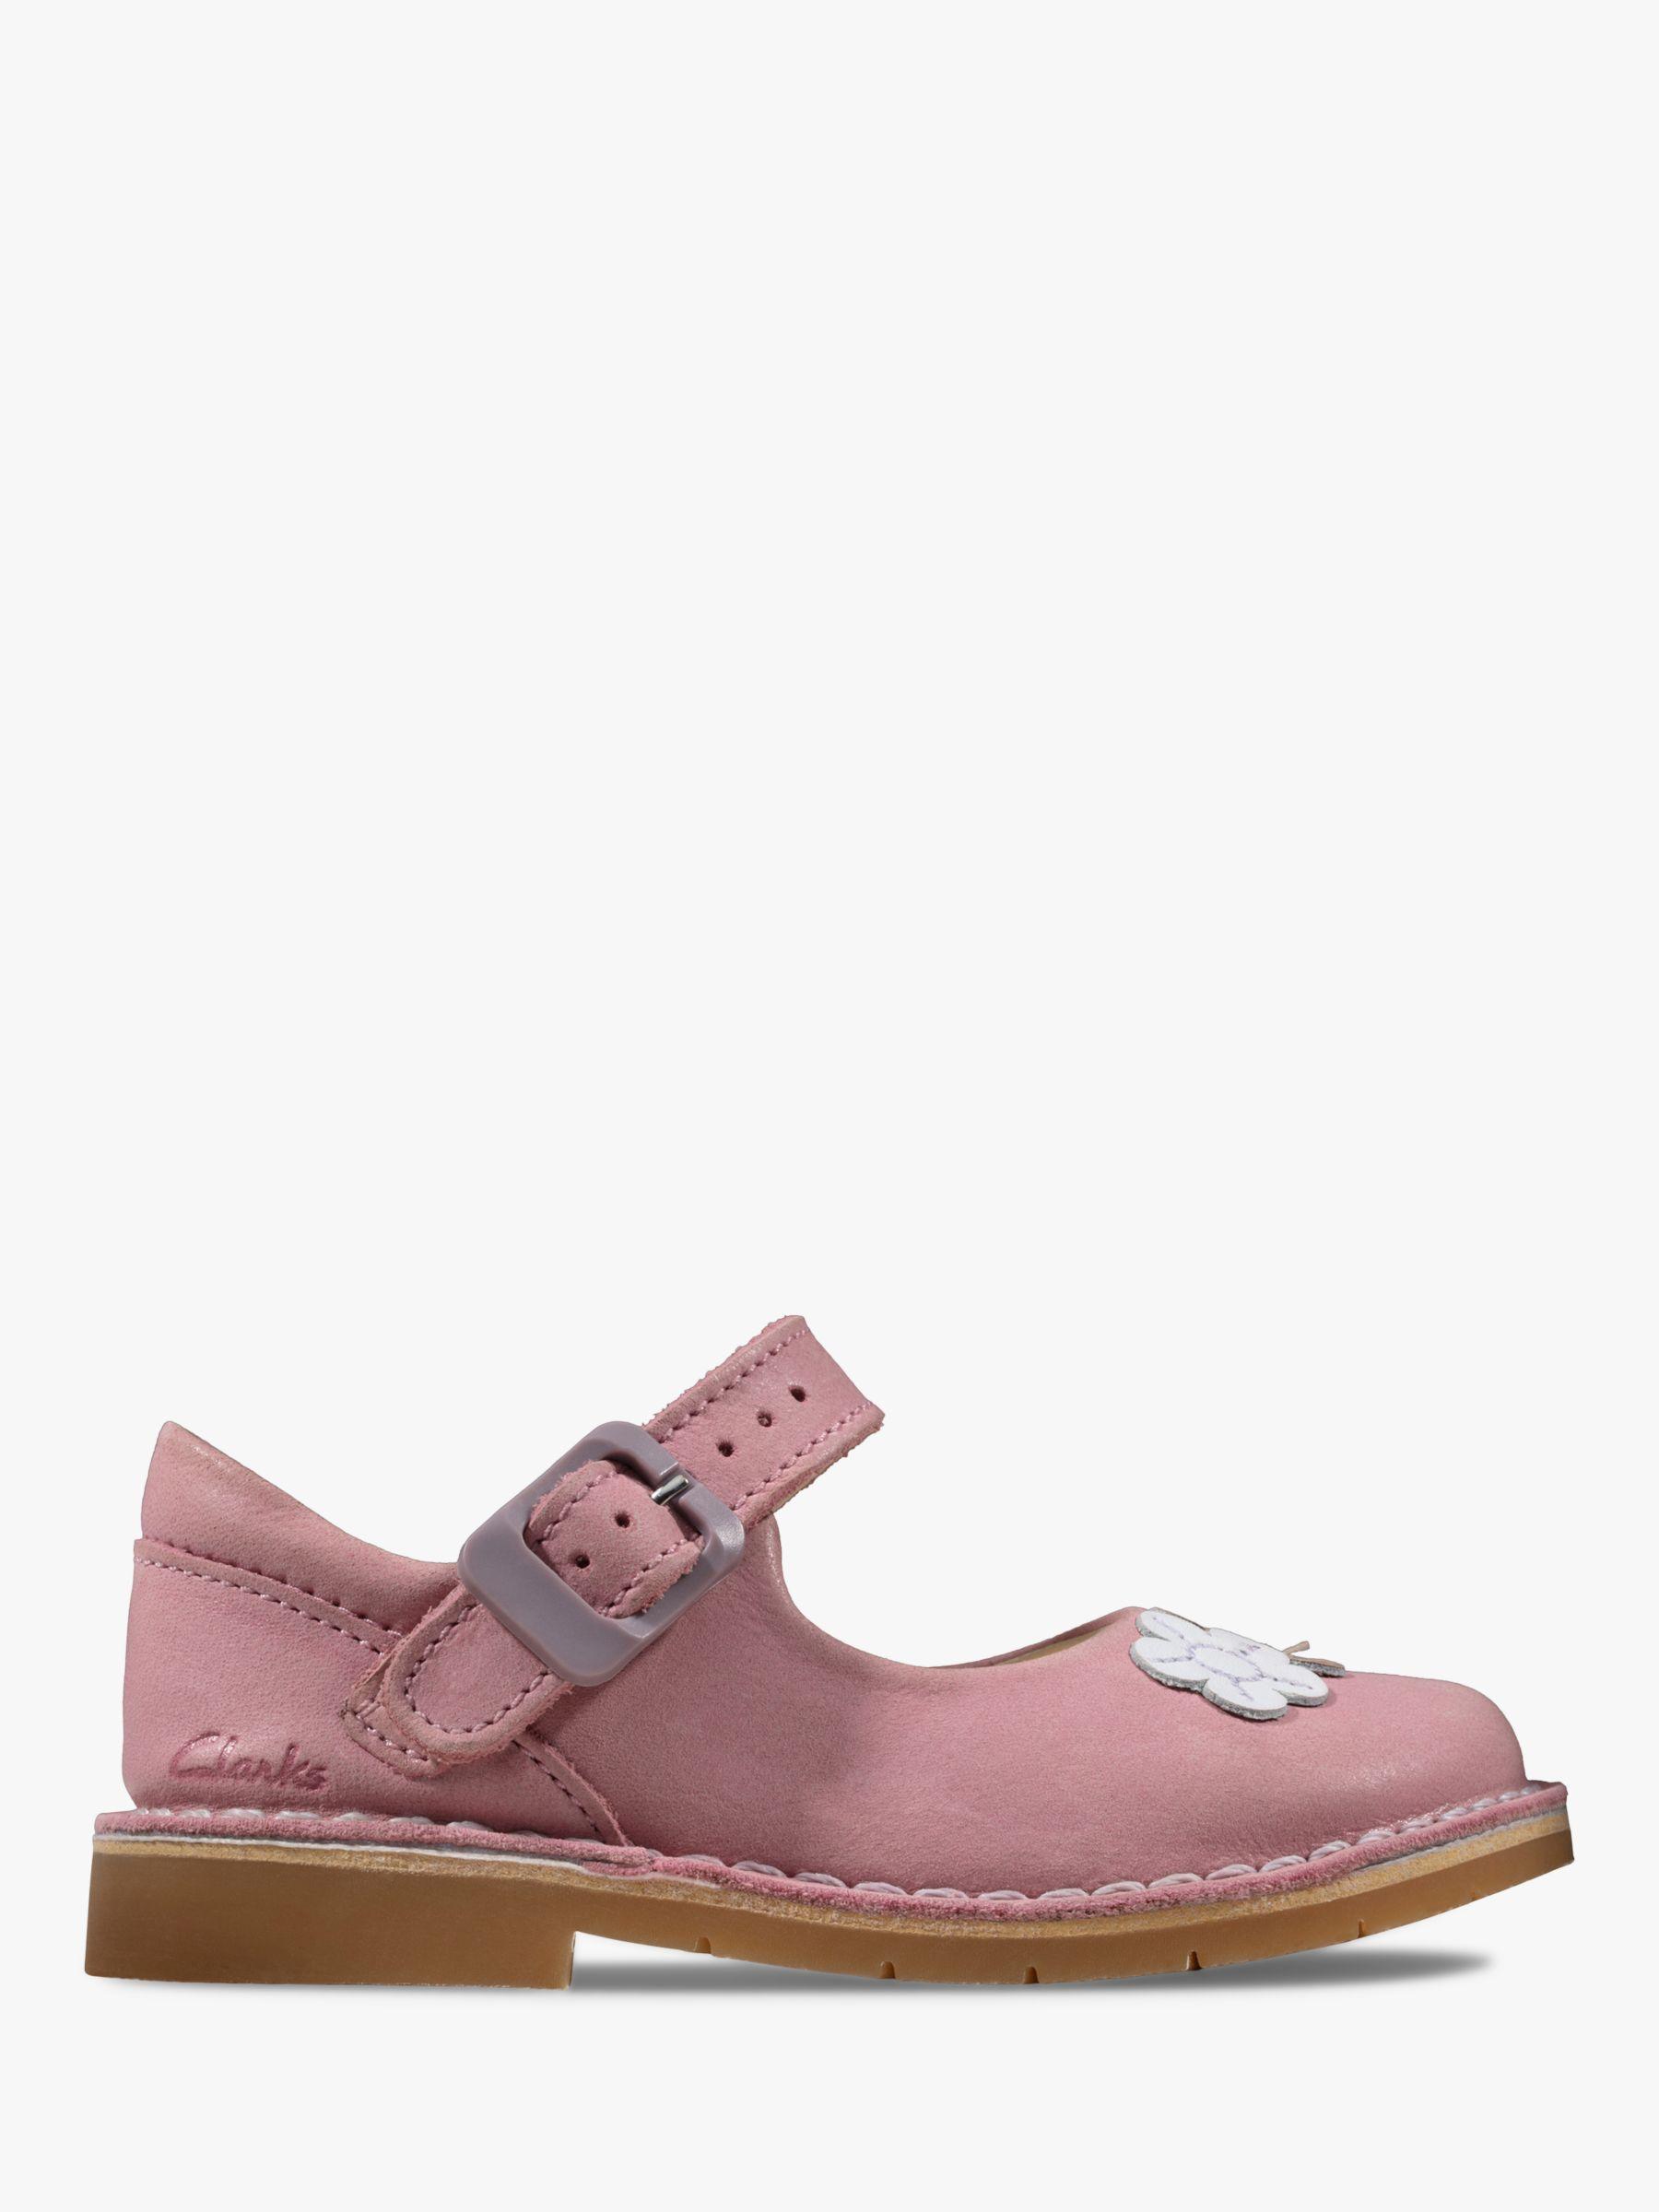 Clarks Children's Comet Gem T-Bar Shoes, Dusty Pink at ...